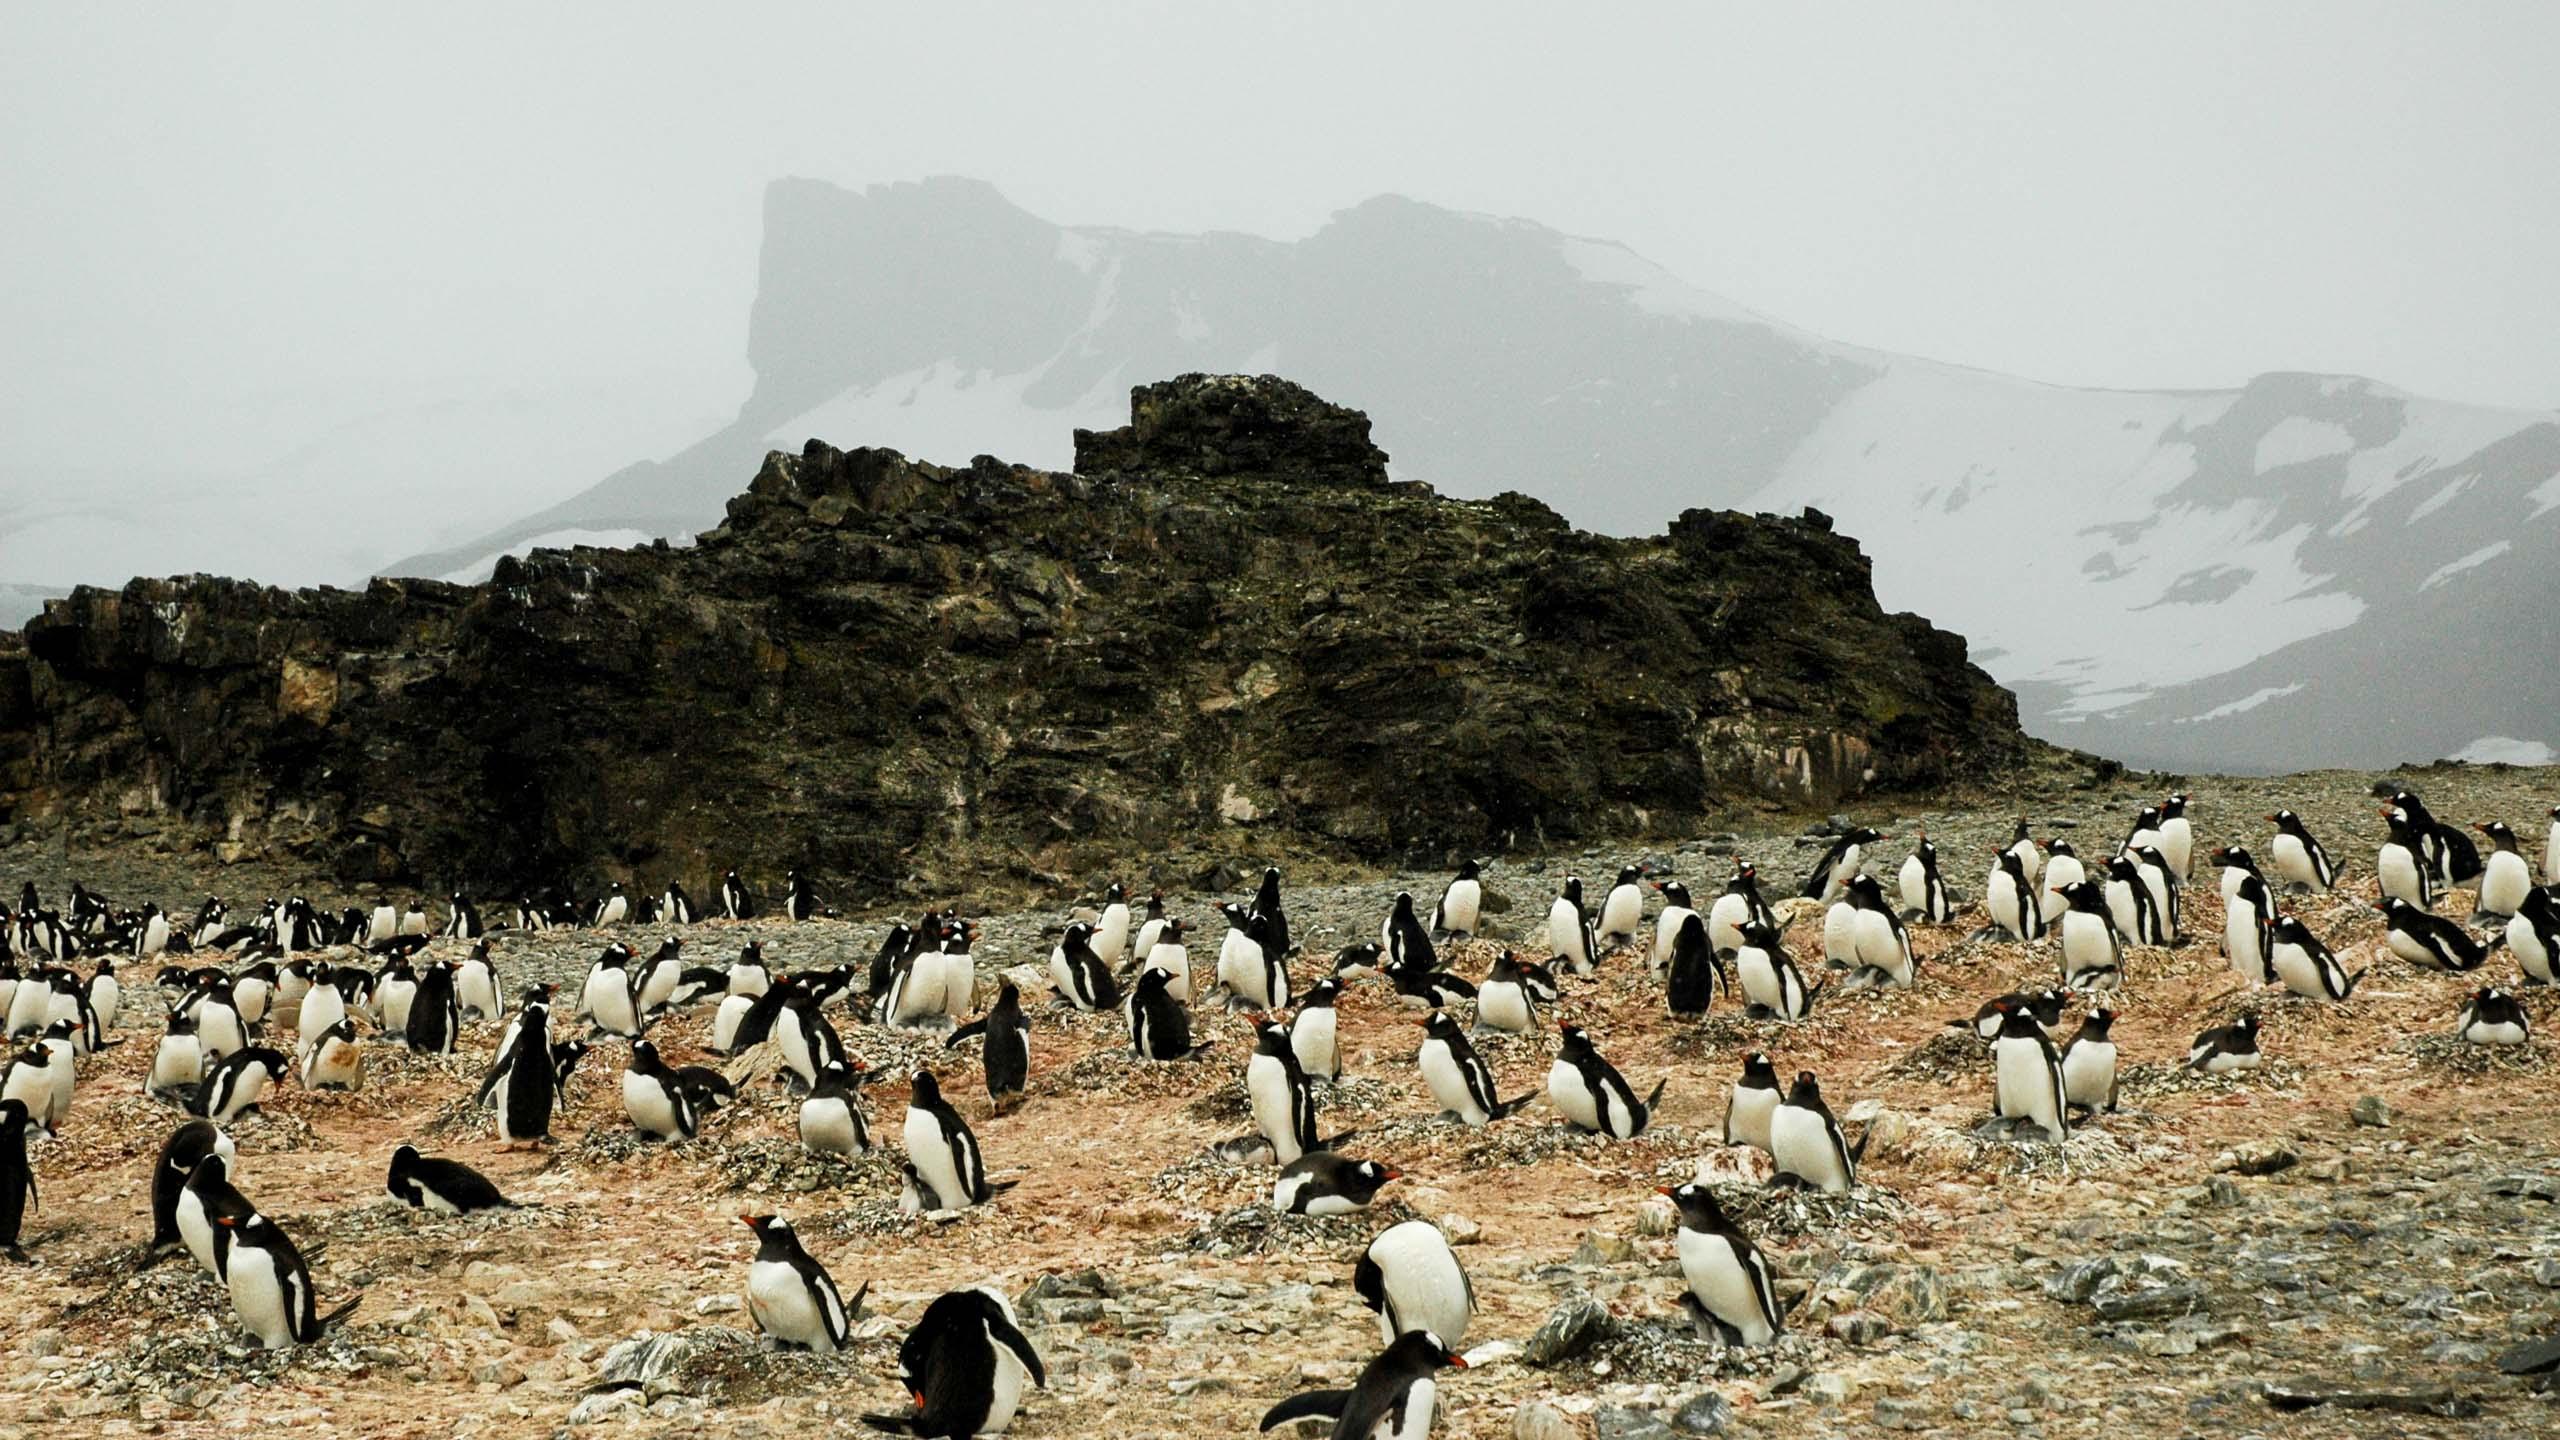 Large group of penguins walks across Antarctica landscape